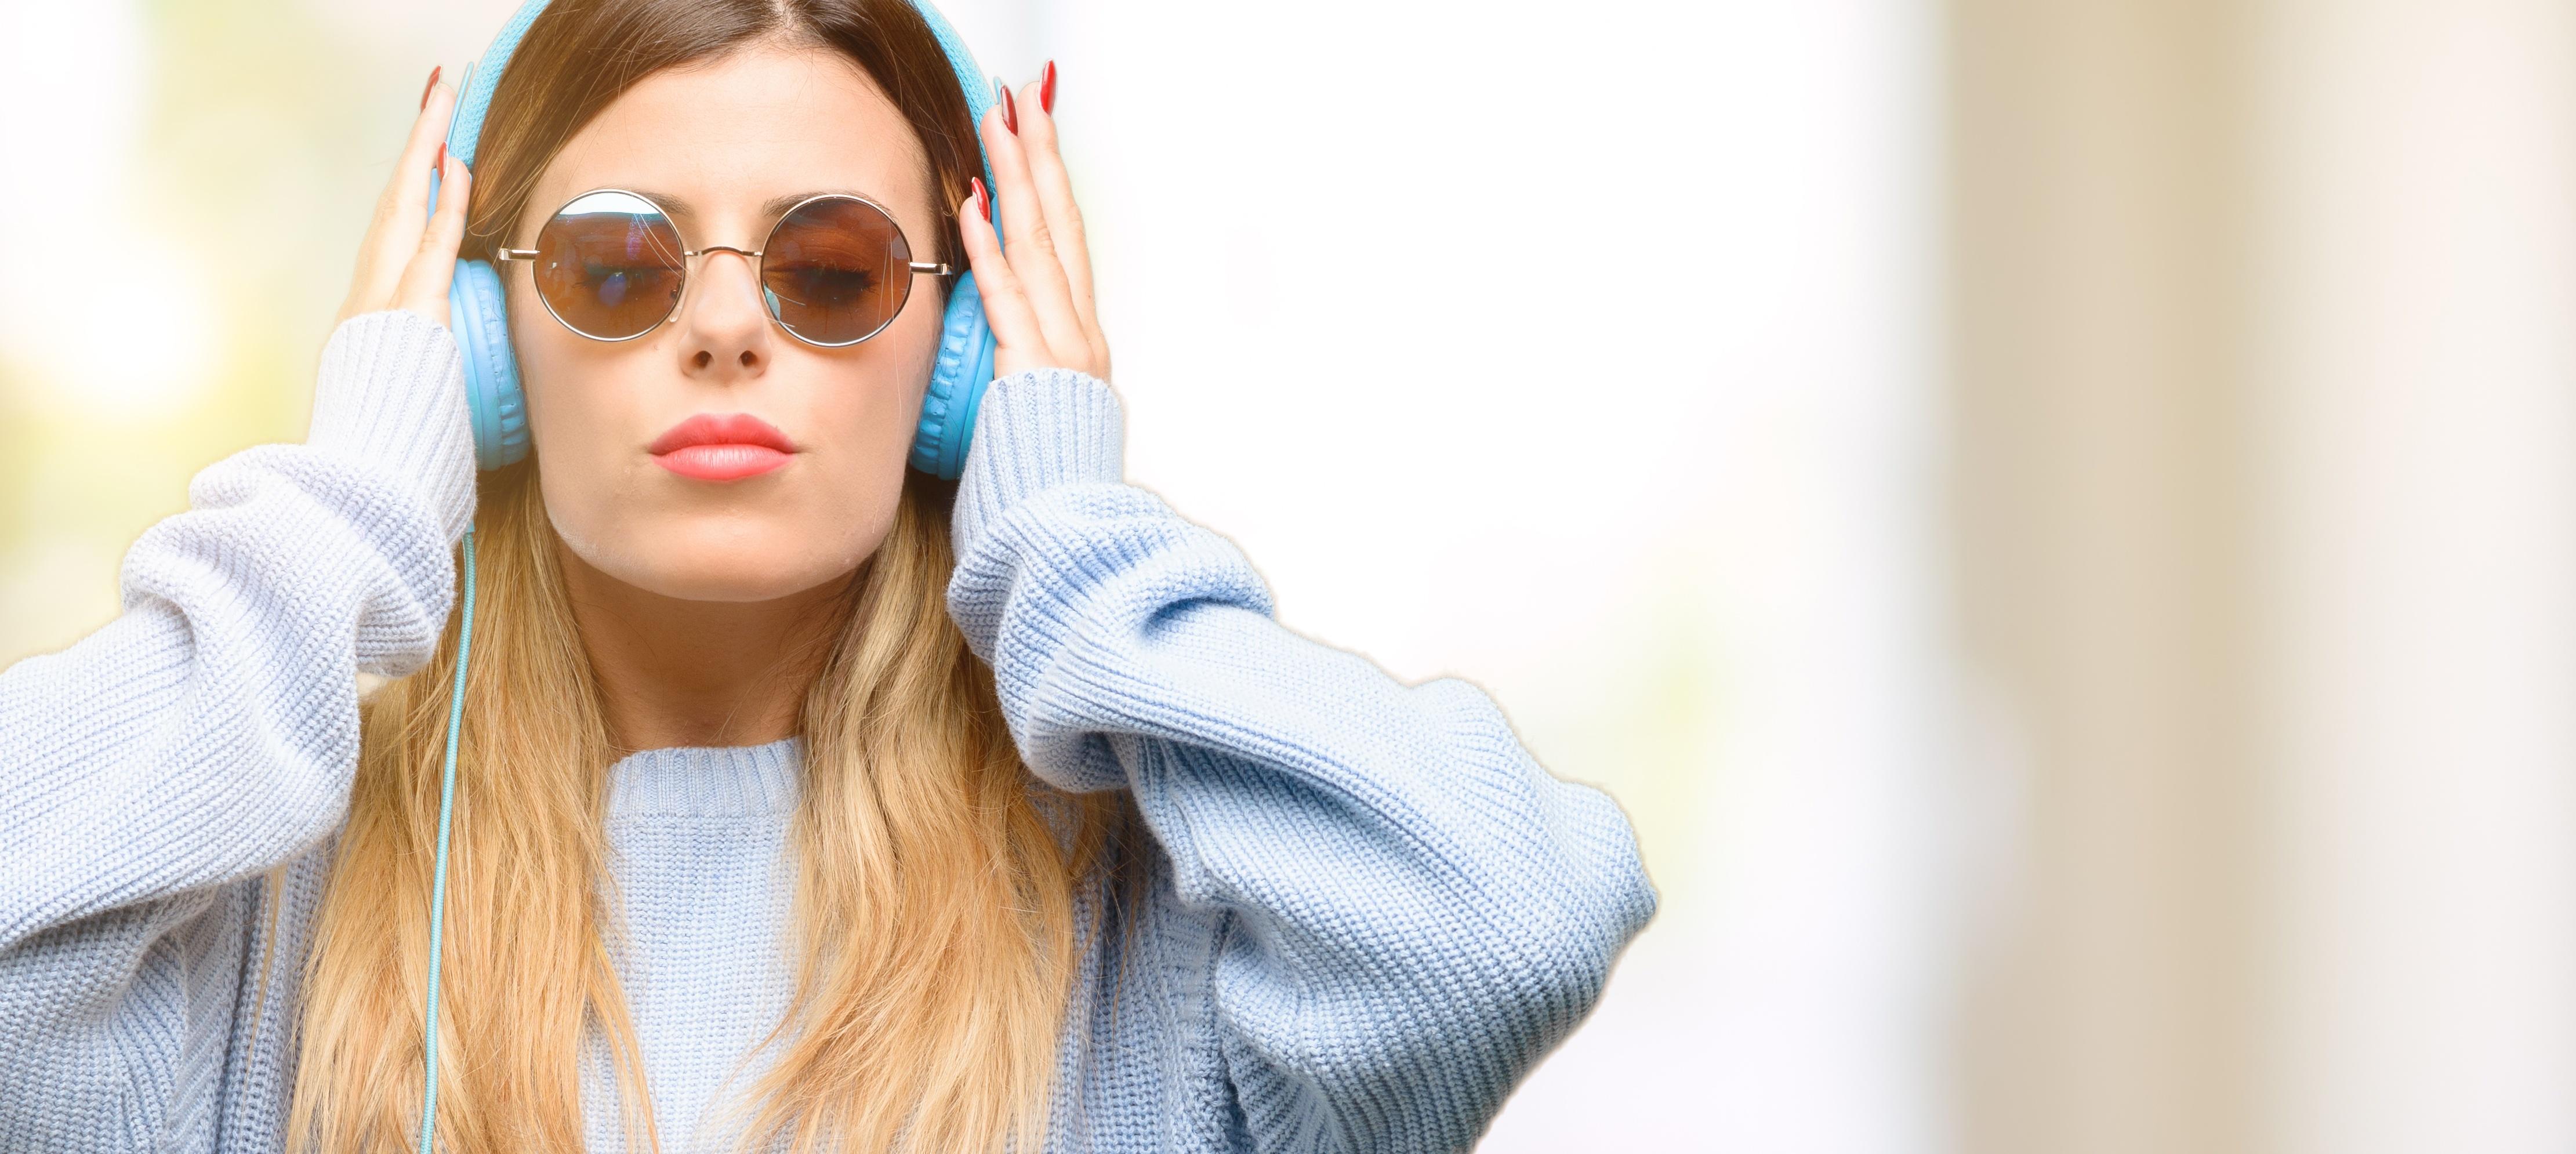 headphones, woman, music